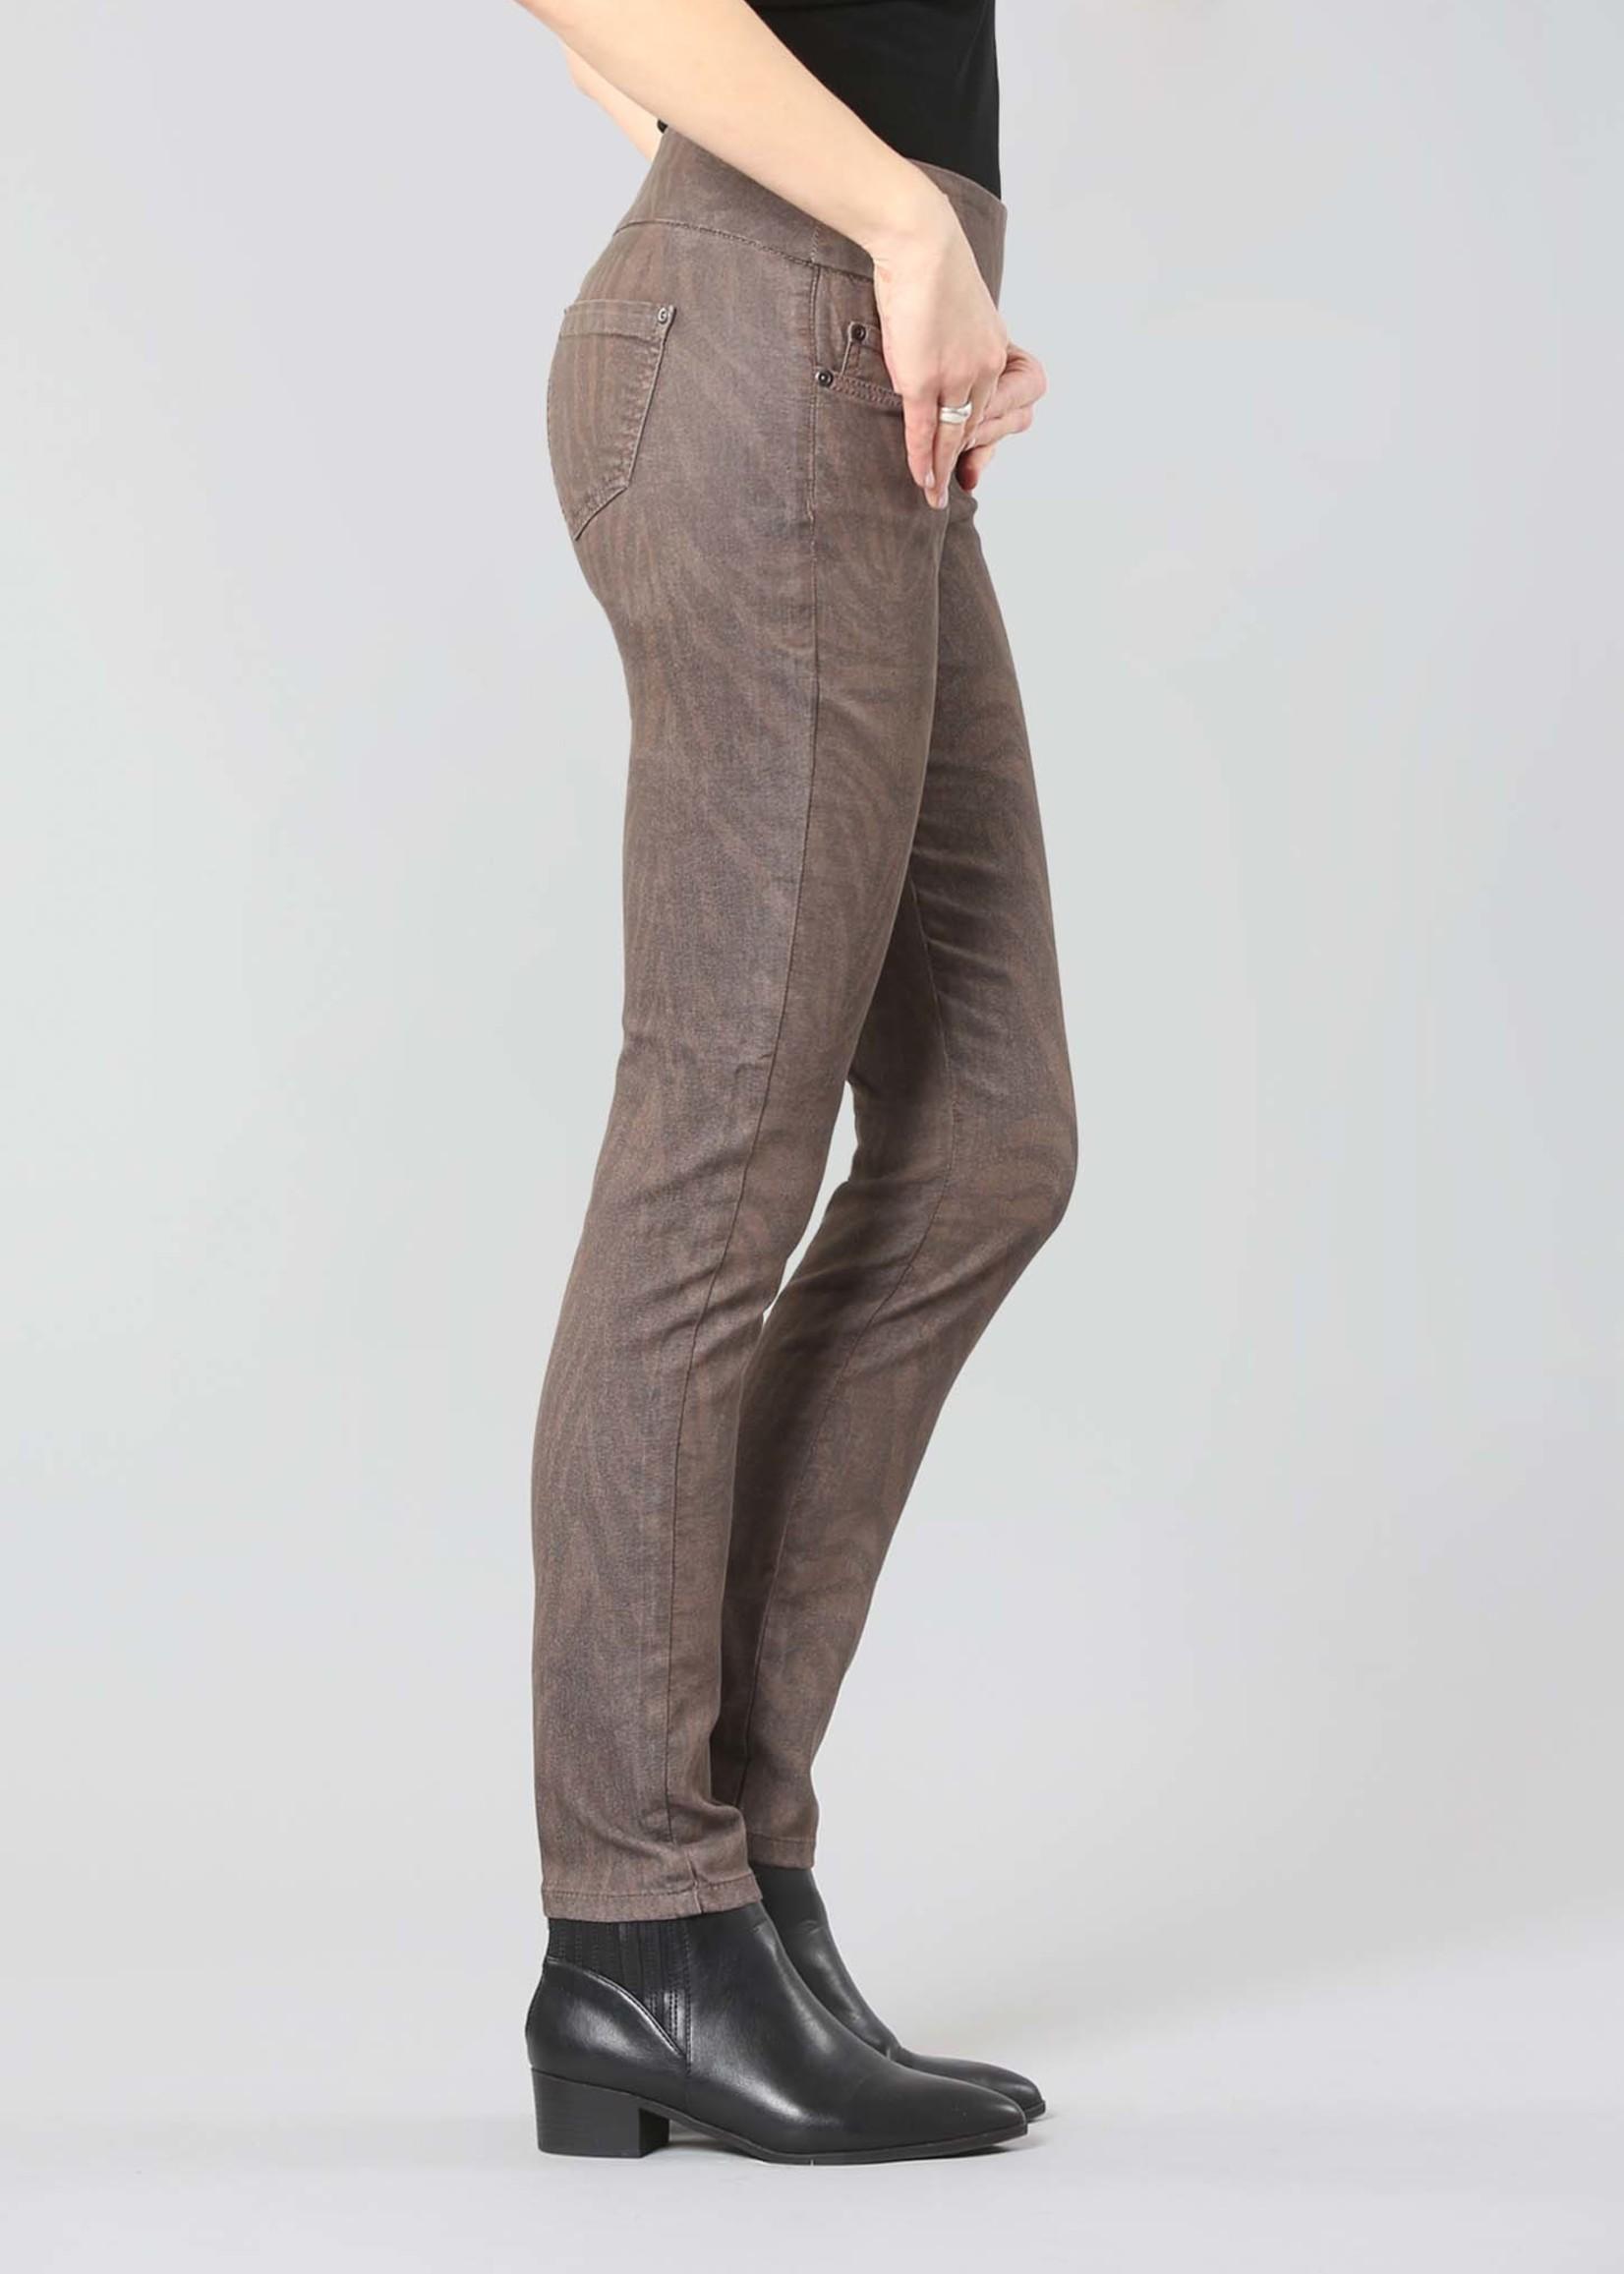 Lisette L Lisette L Mozamba Print Slim Leg Pant